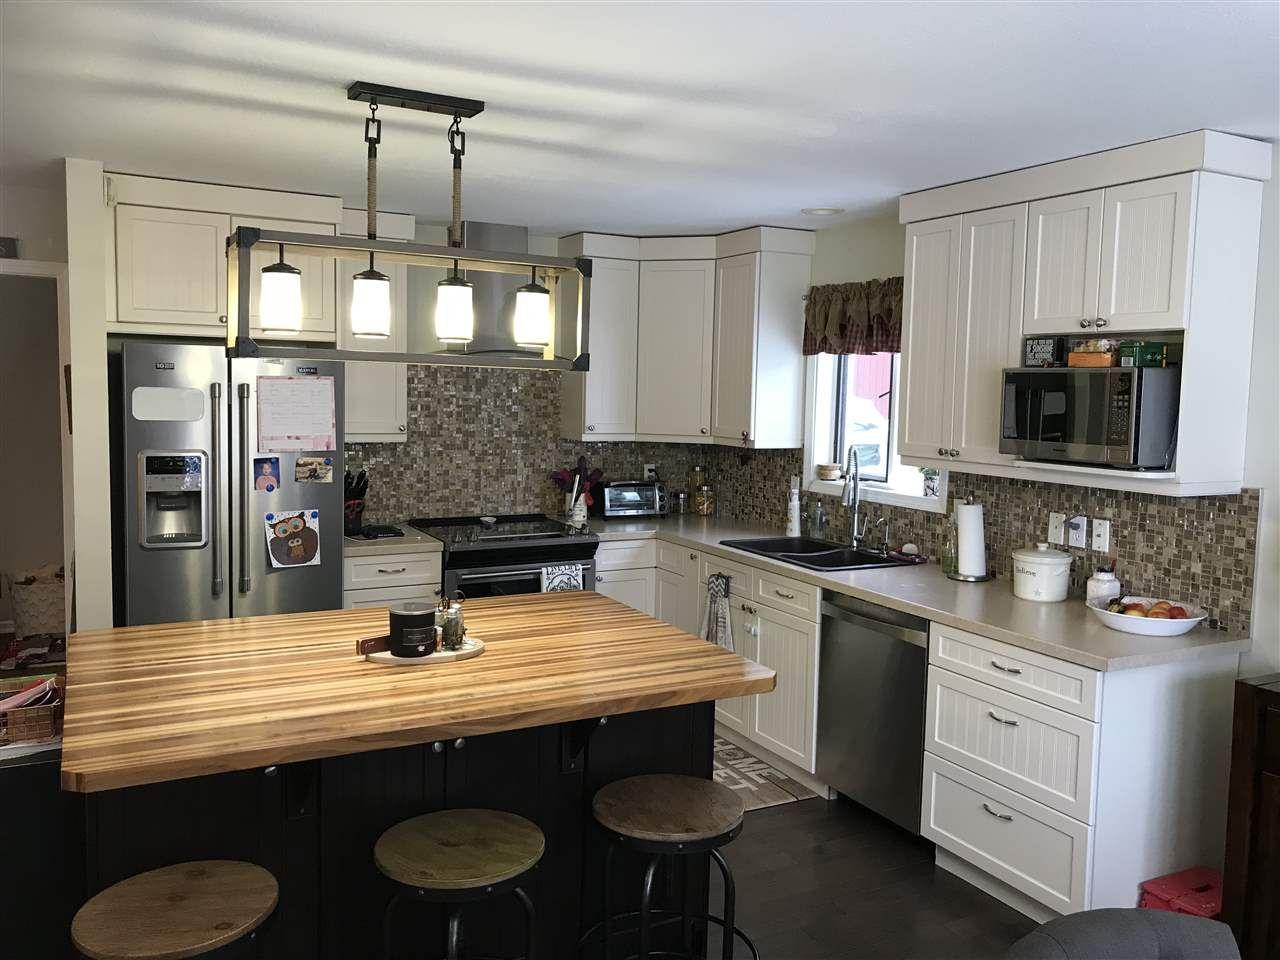 Photo 3: Photos: 10516 113 Avenue in Fort St. John: Fort St. John - City NW House for sale (Fort St. John (Zone 60))  : MLS®# R2535649